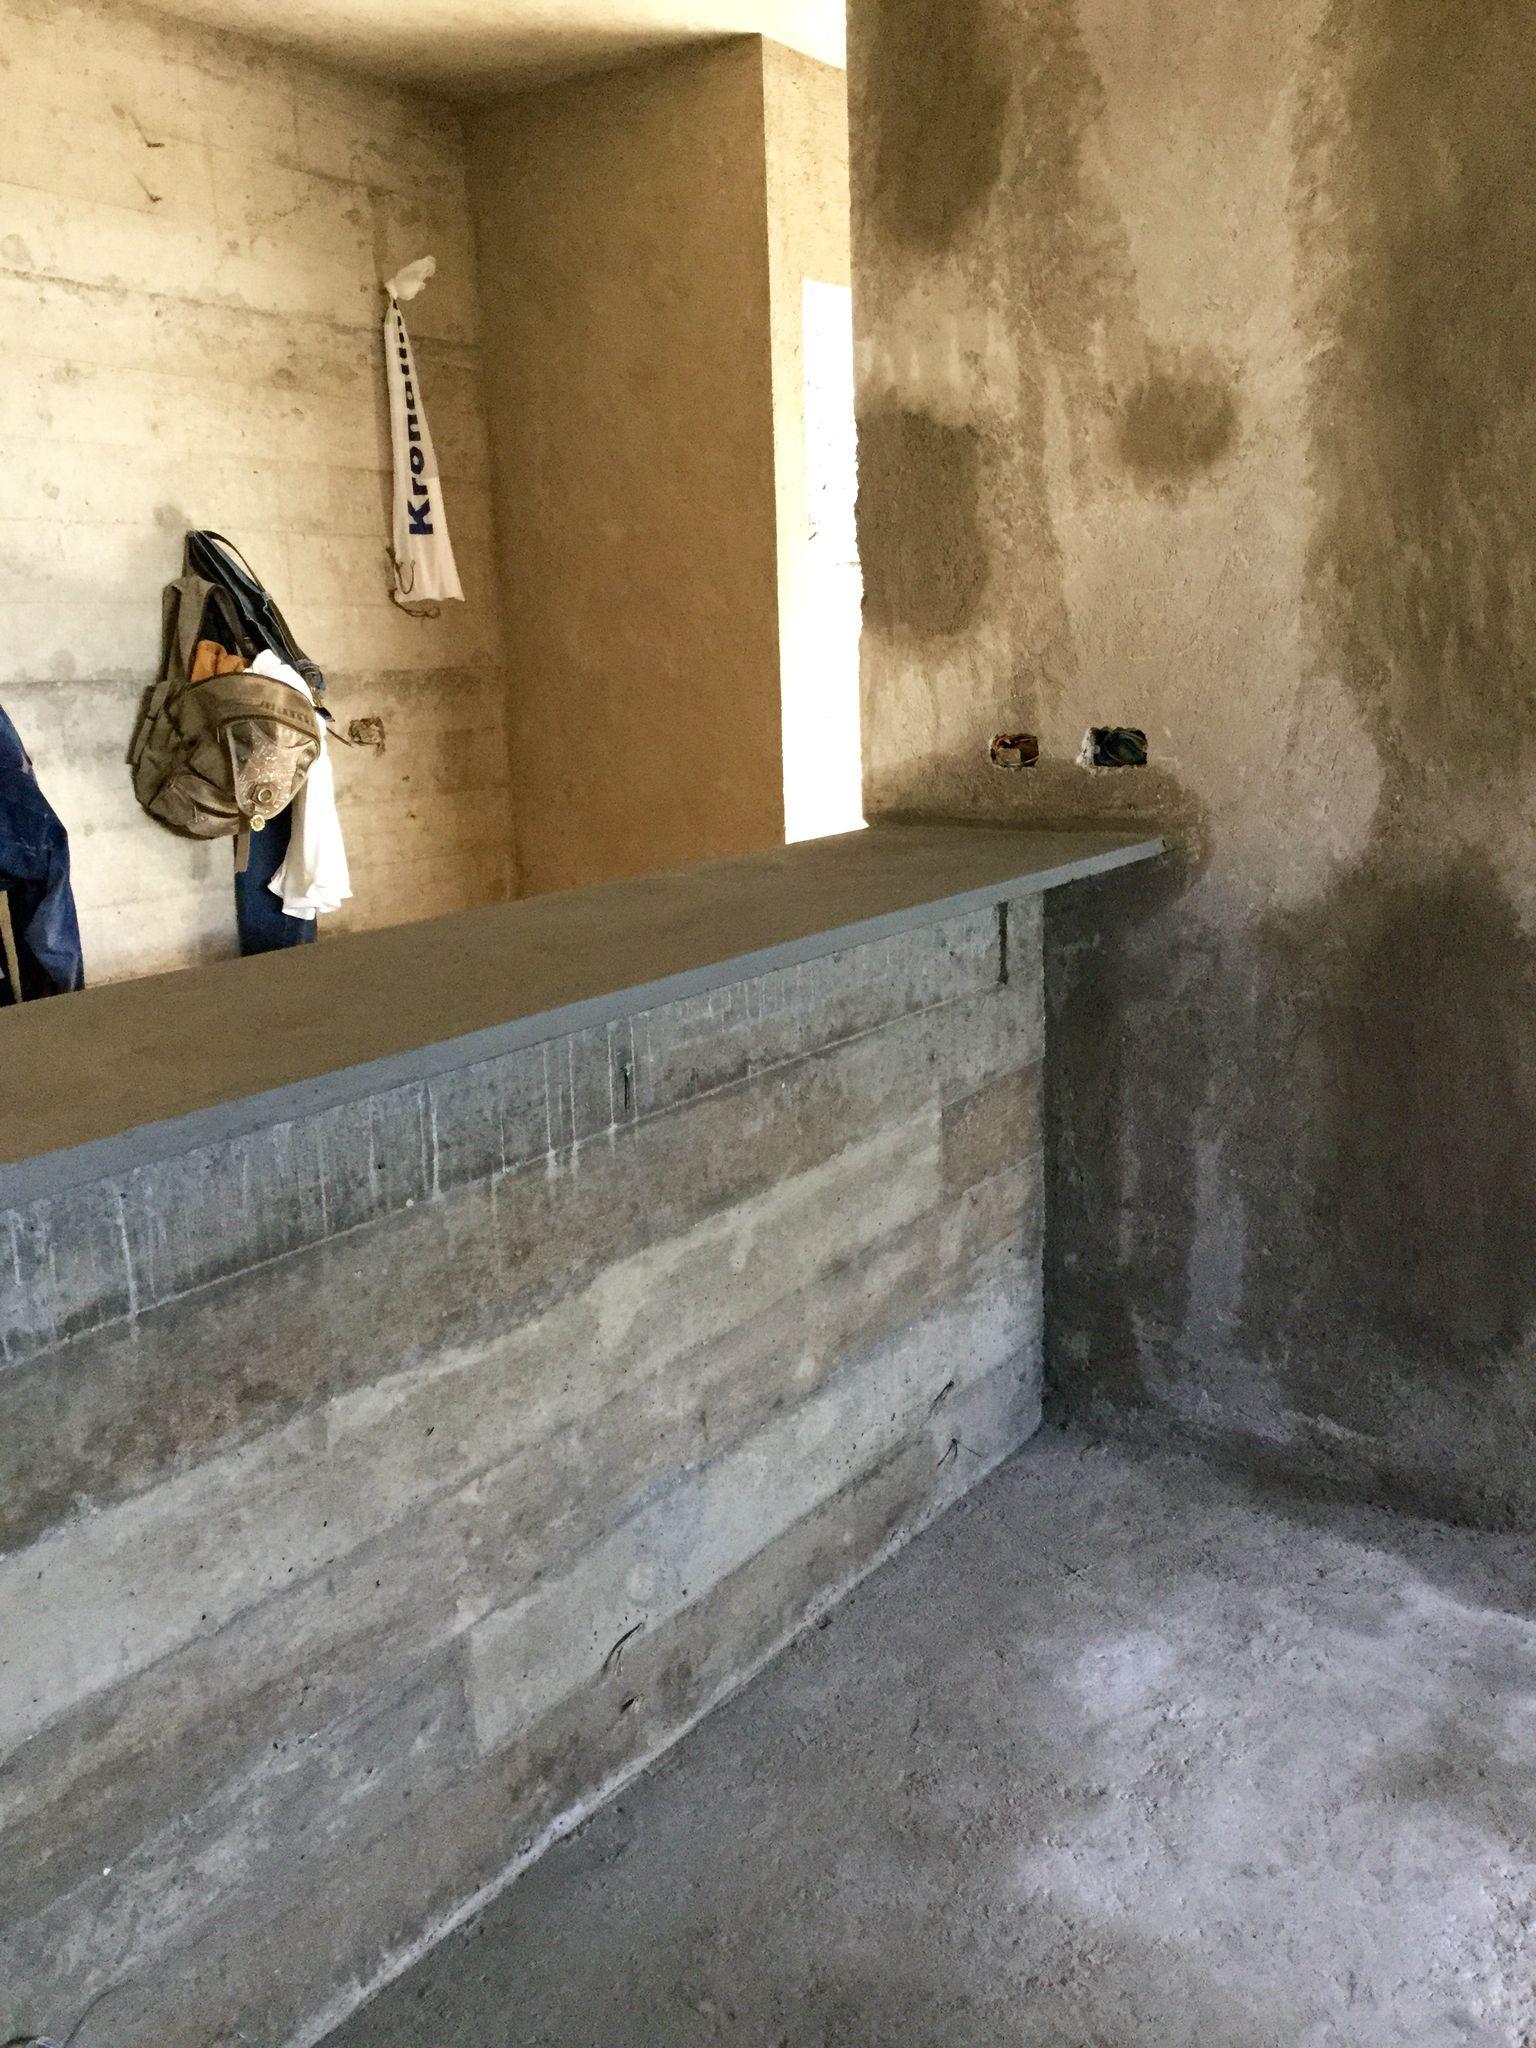 Cocina muros y barra en concreto armado aparente cada for Barras de cocina de concreto